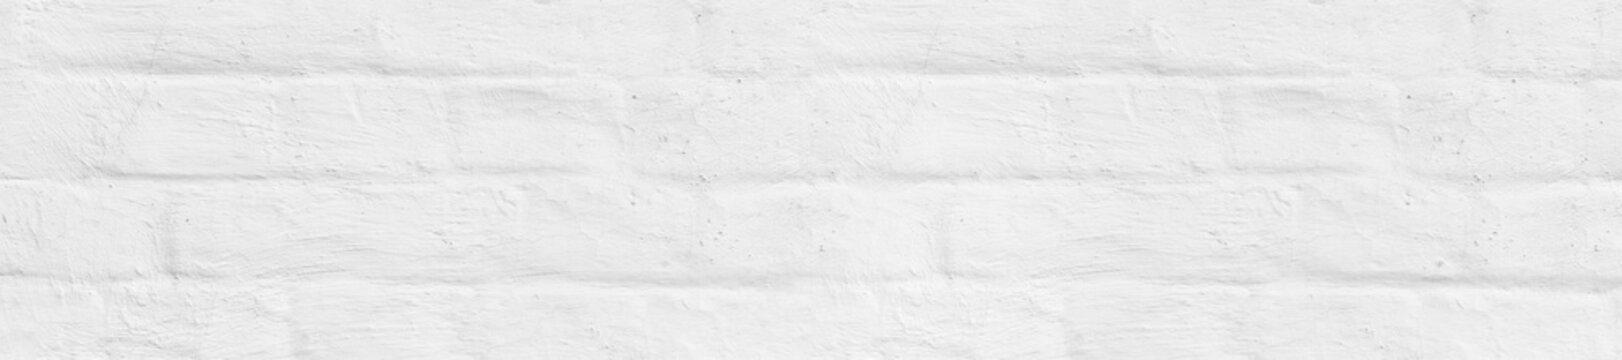 panorama old white whitewashed brick wall